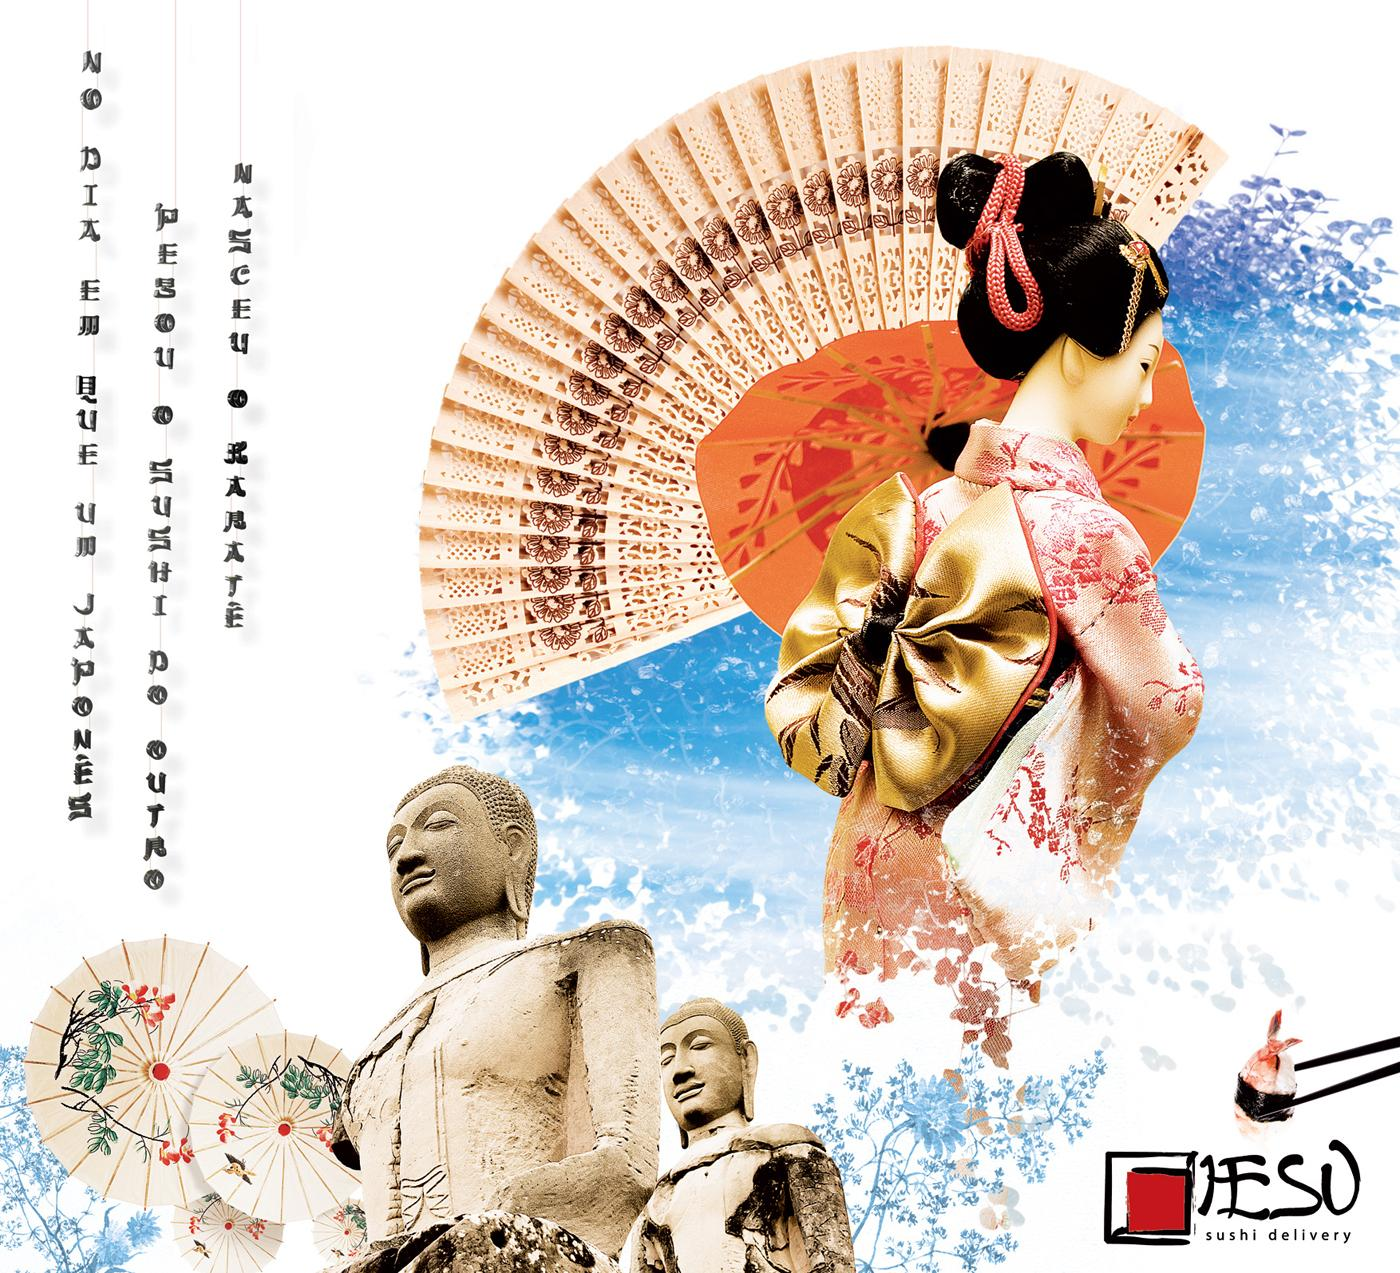 IESU Print Ad -  Karate